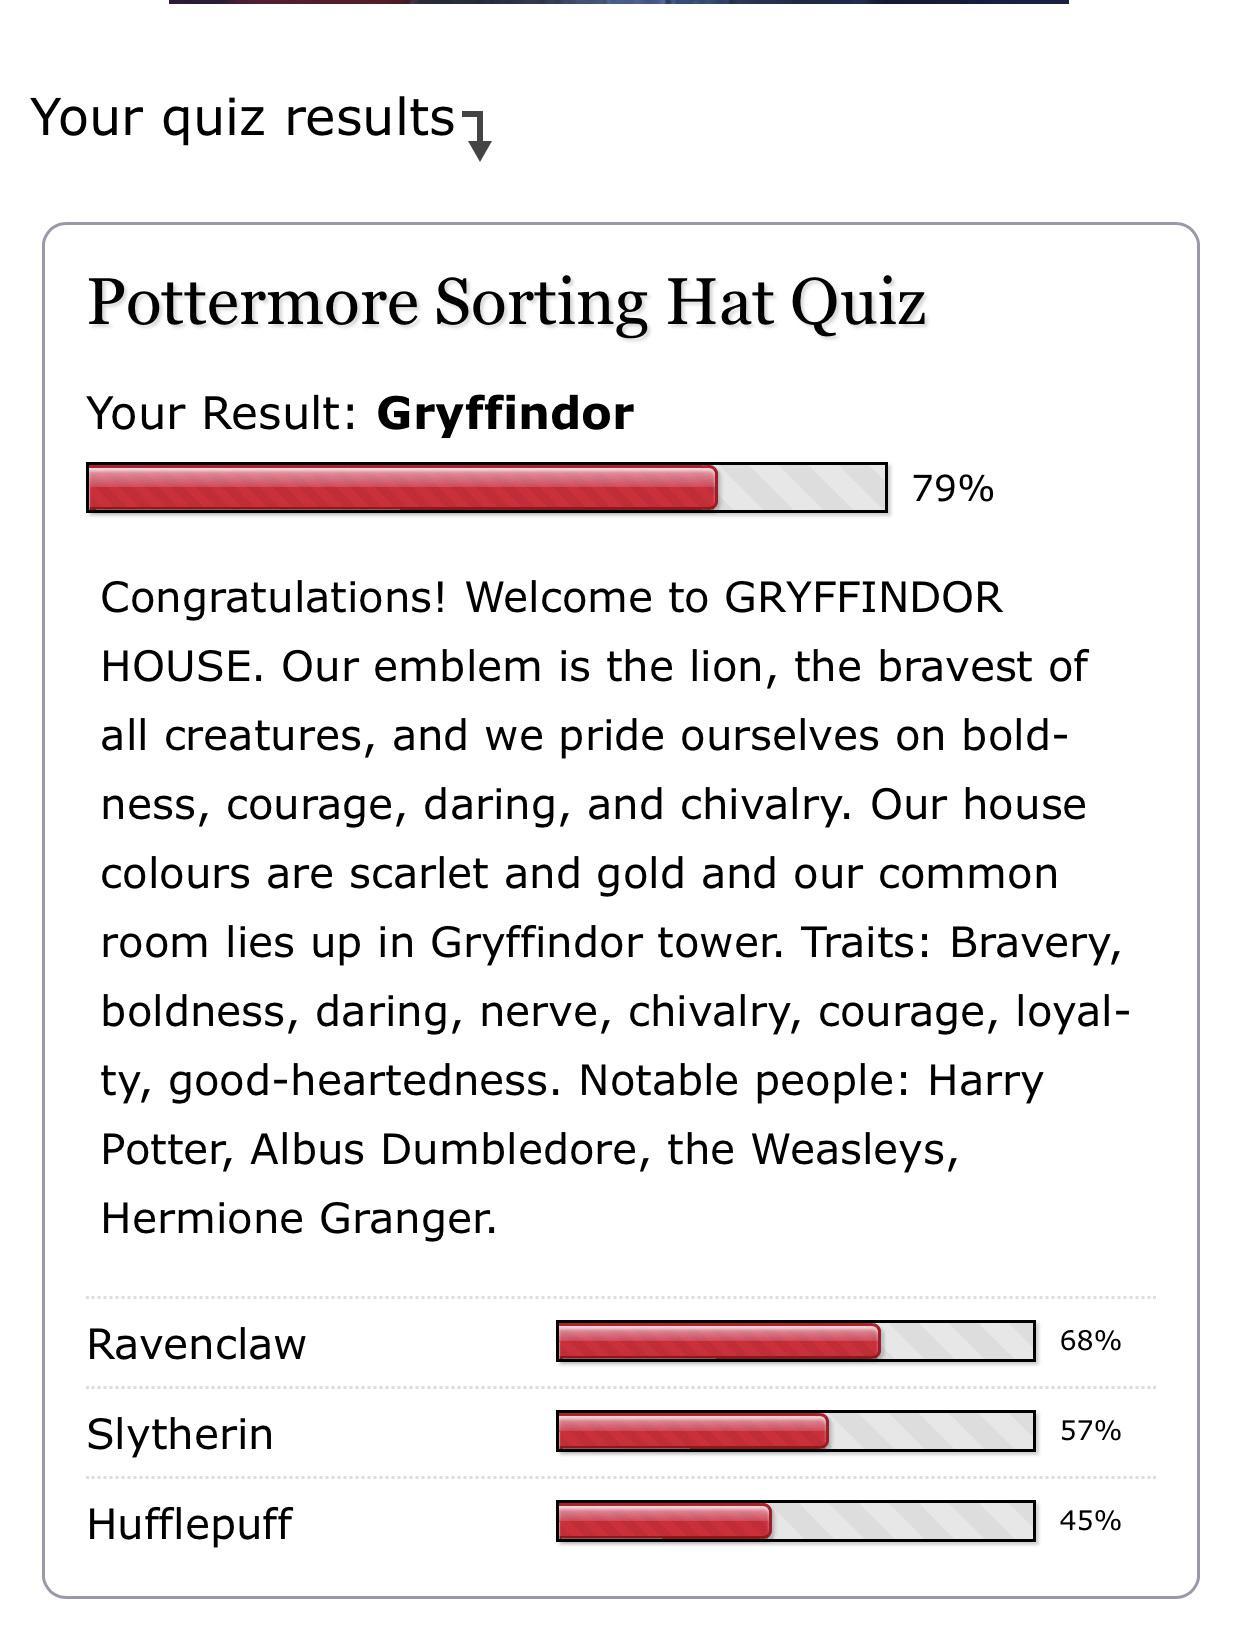 Pottermore All Questions House Quiz : pottermore, questions, house, Post/Pottermore, Sorting, Results, Harrypotter